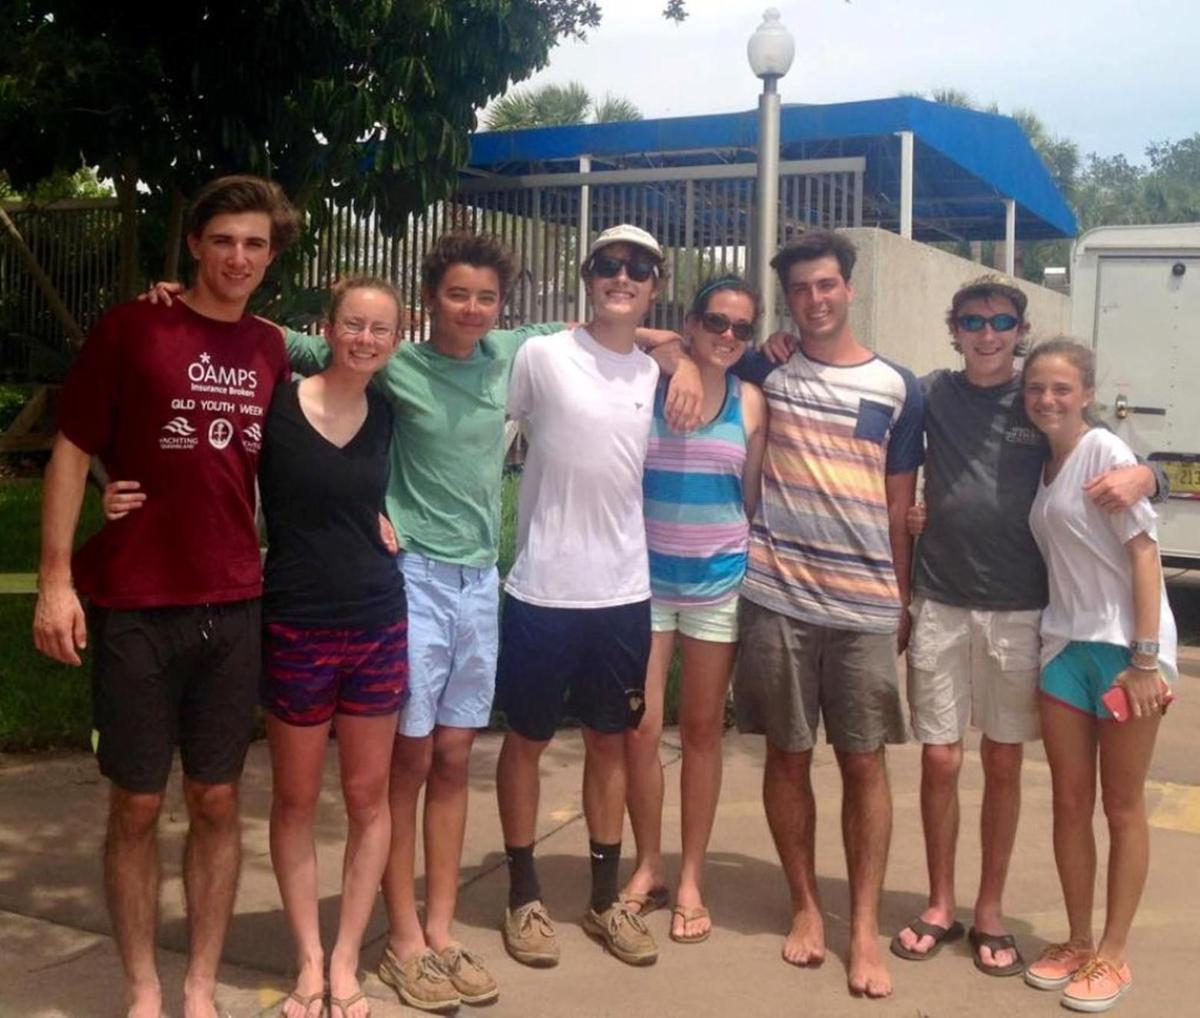 Wando sailors 11th in national championship